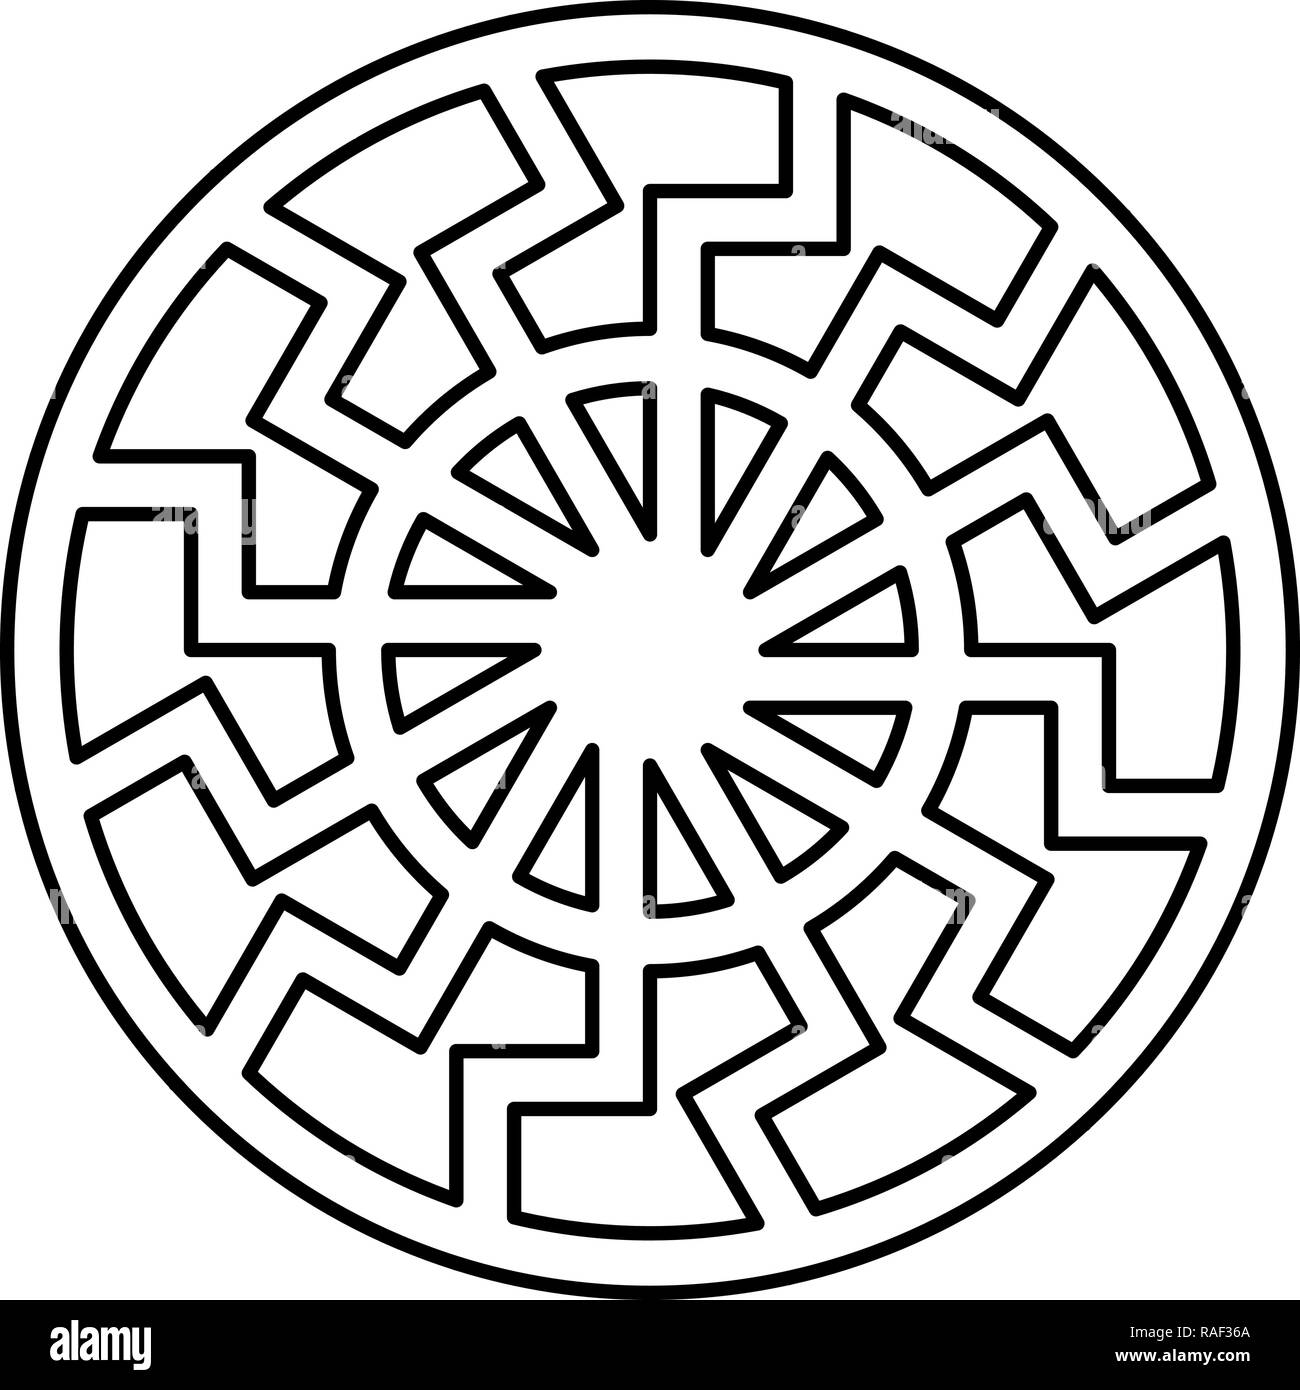 Black sun symbol icon black color vector I flat style simple image - Stock Image